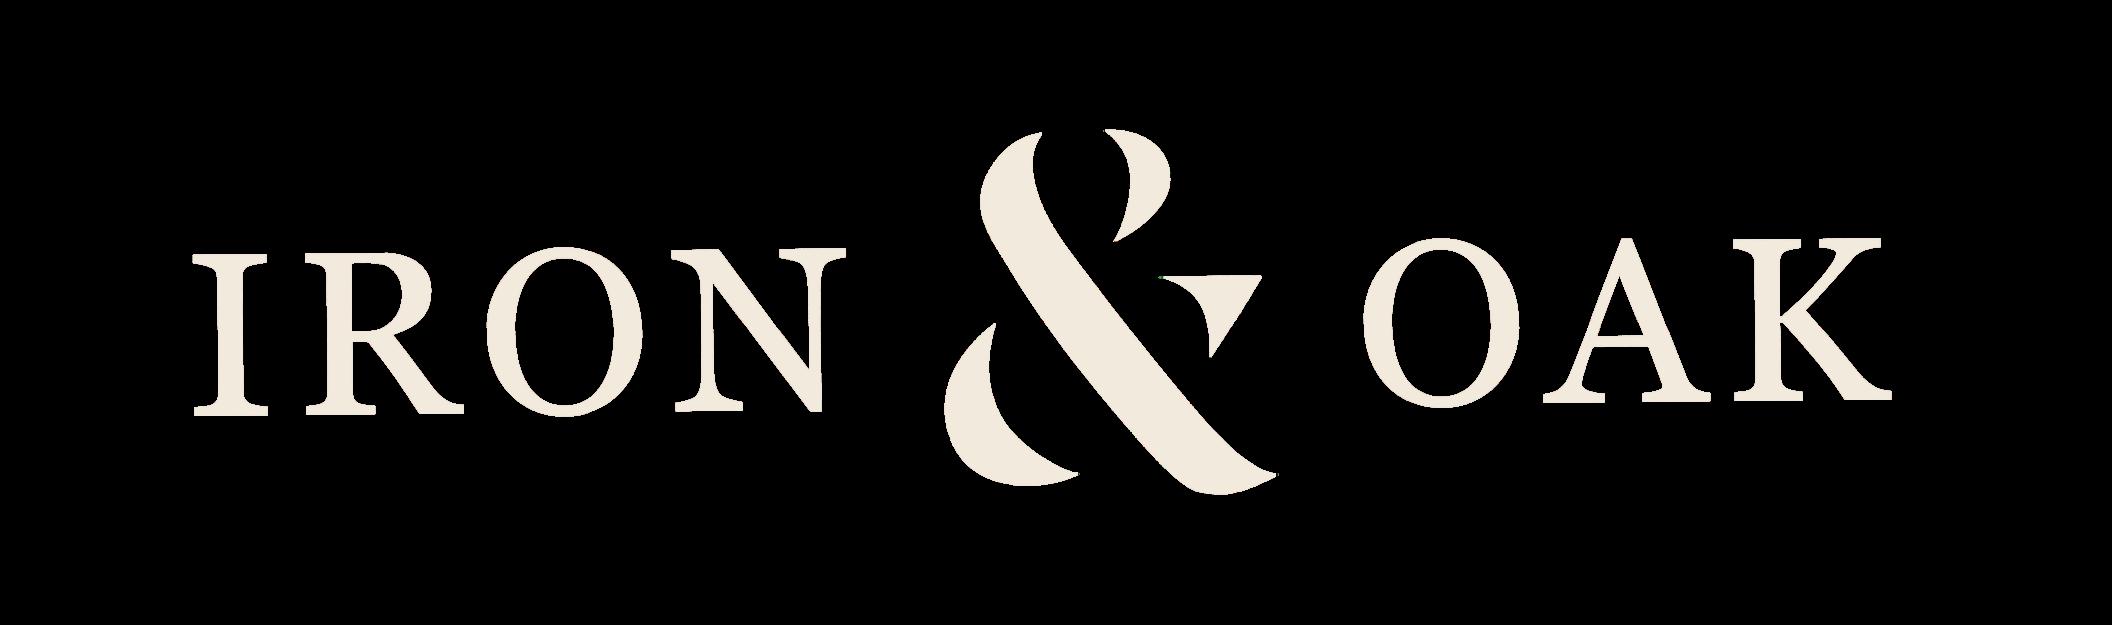 StyleGuide-_IRON&OAK-01 3.png